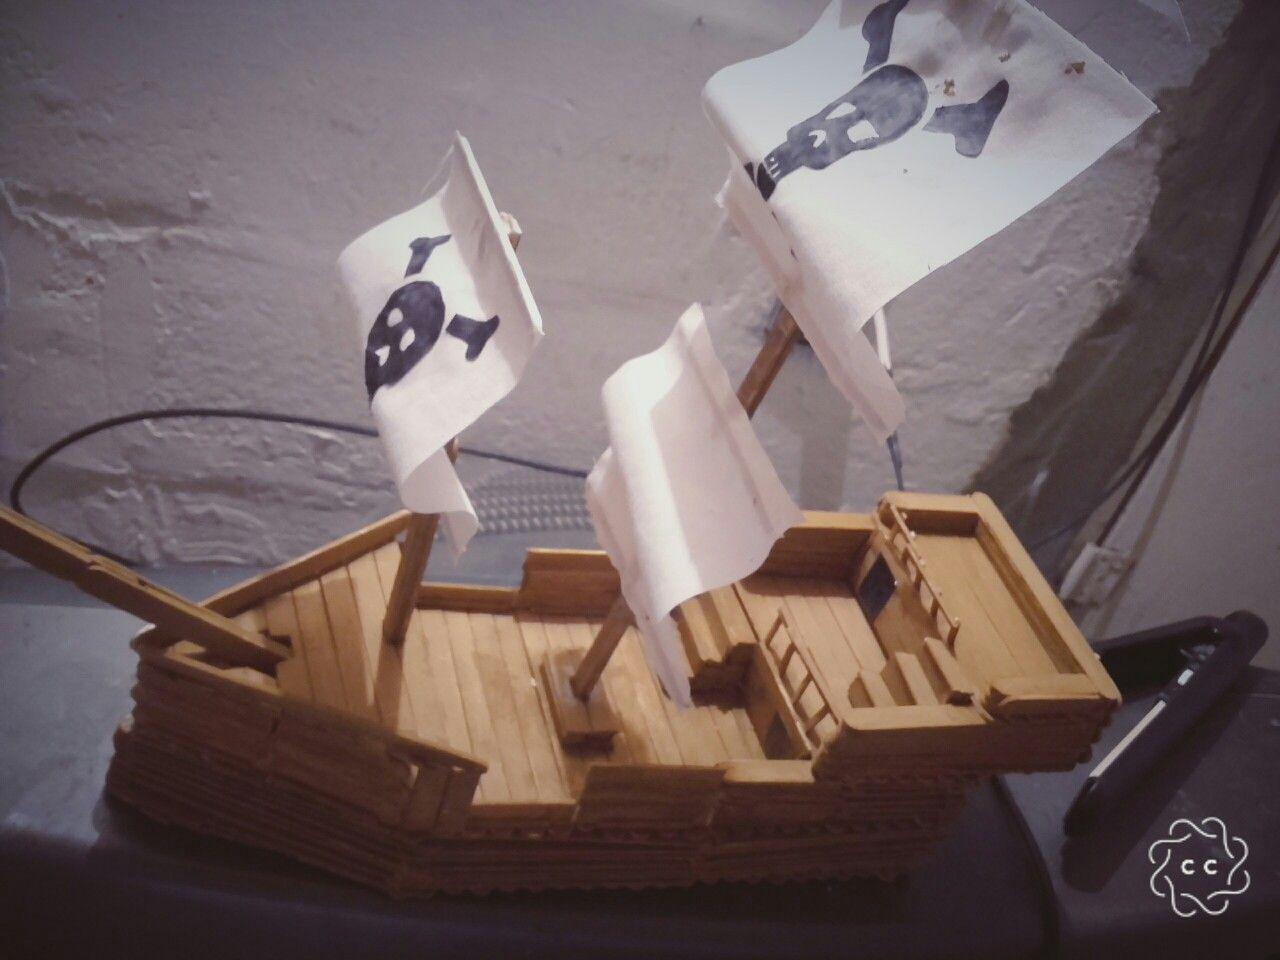 Barco Pirata Con Hechos Con Palitos De Helado Palitos De